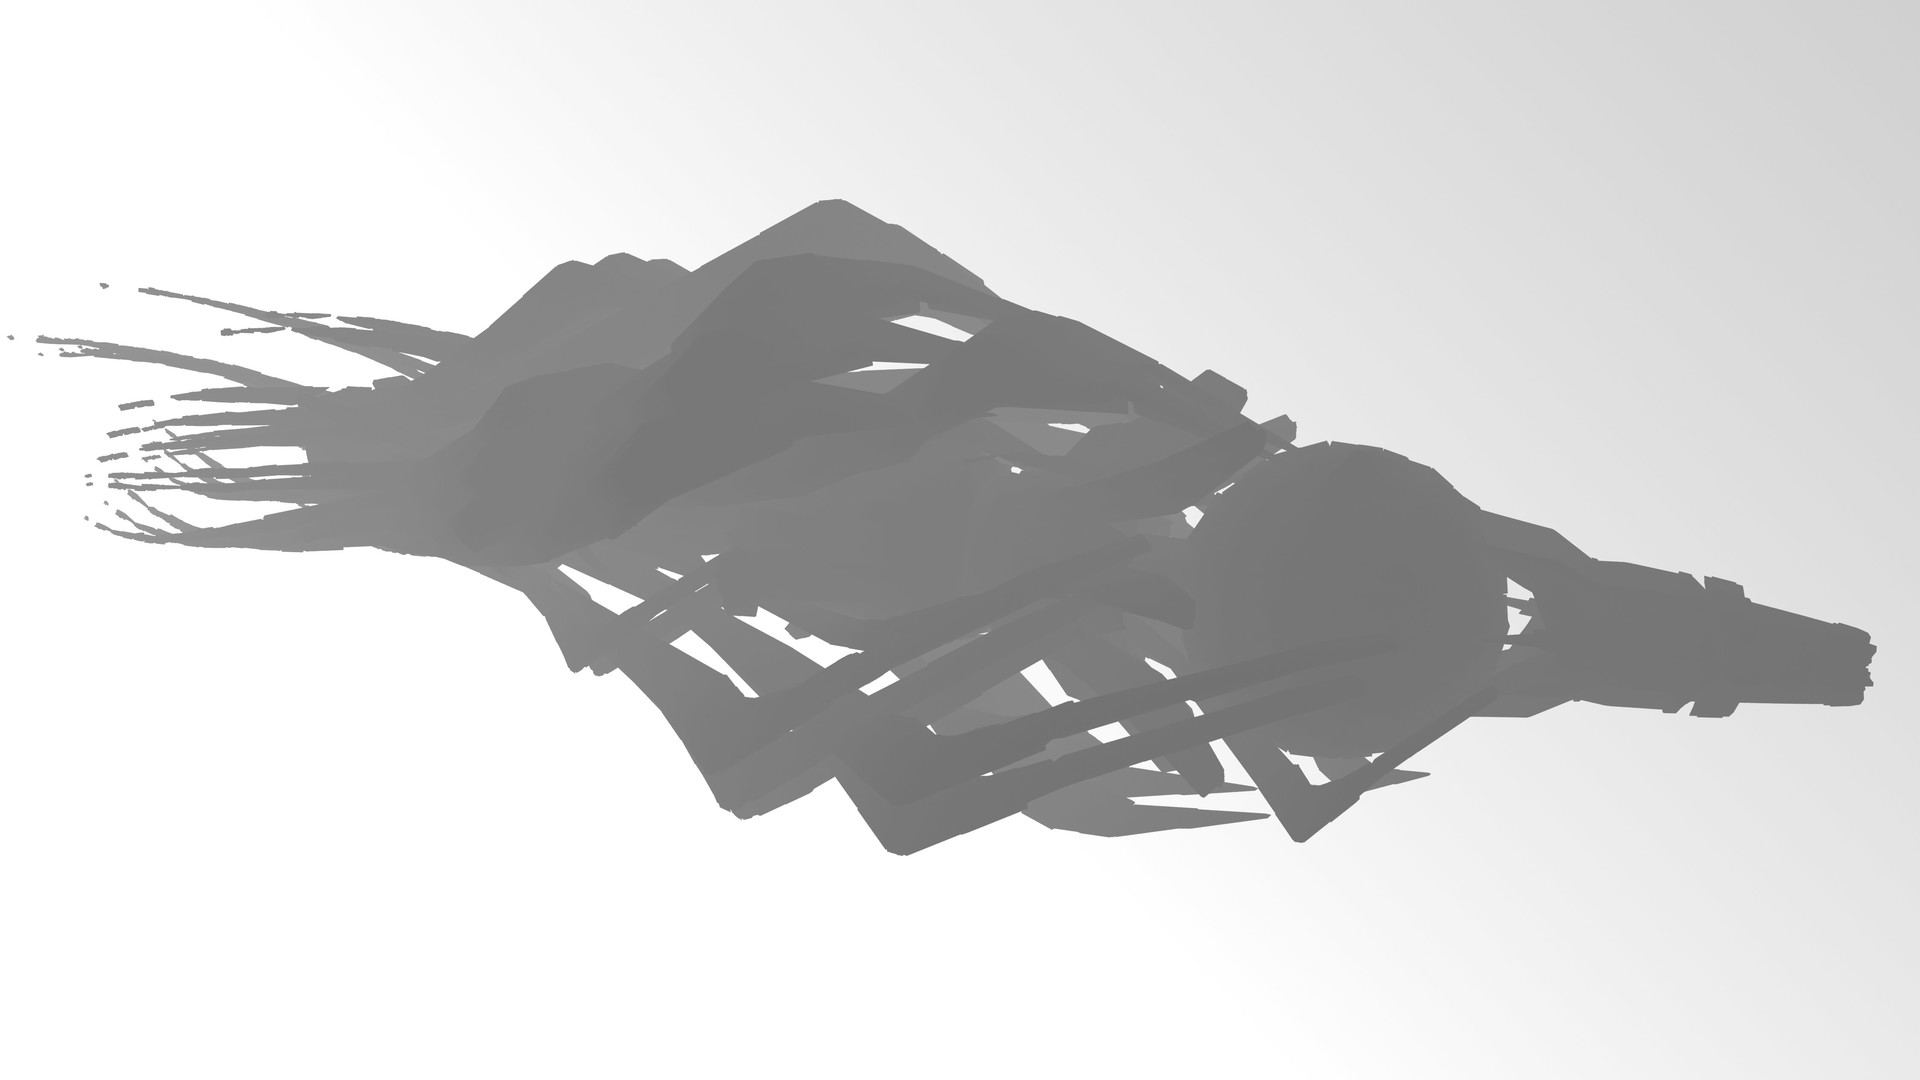 Kresimir jelusic robob3ar 243 120616 z